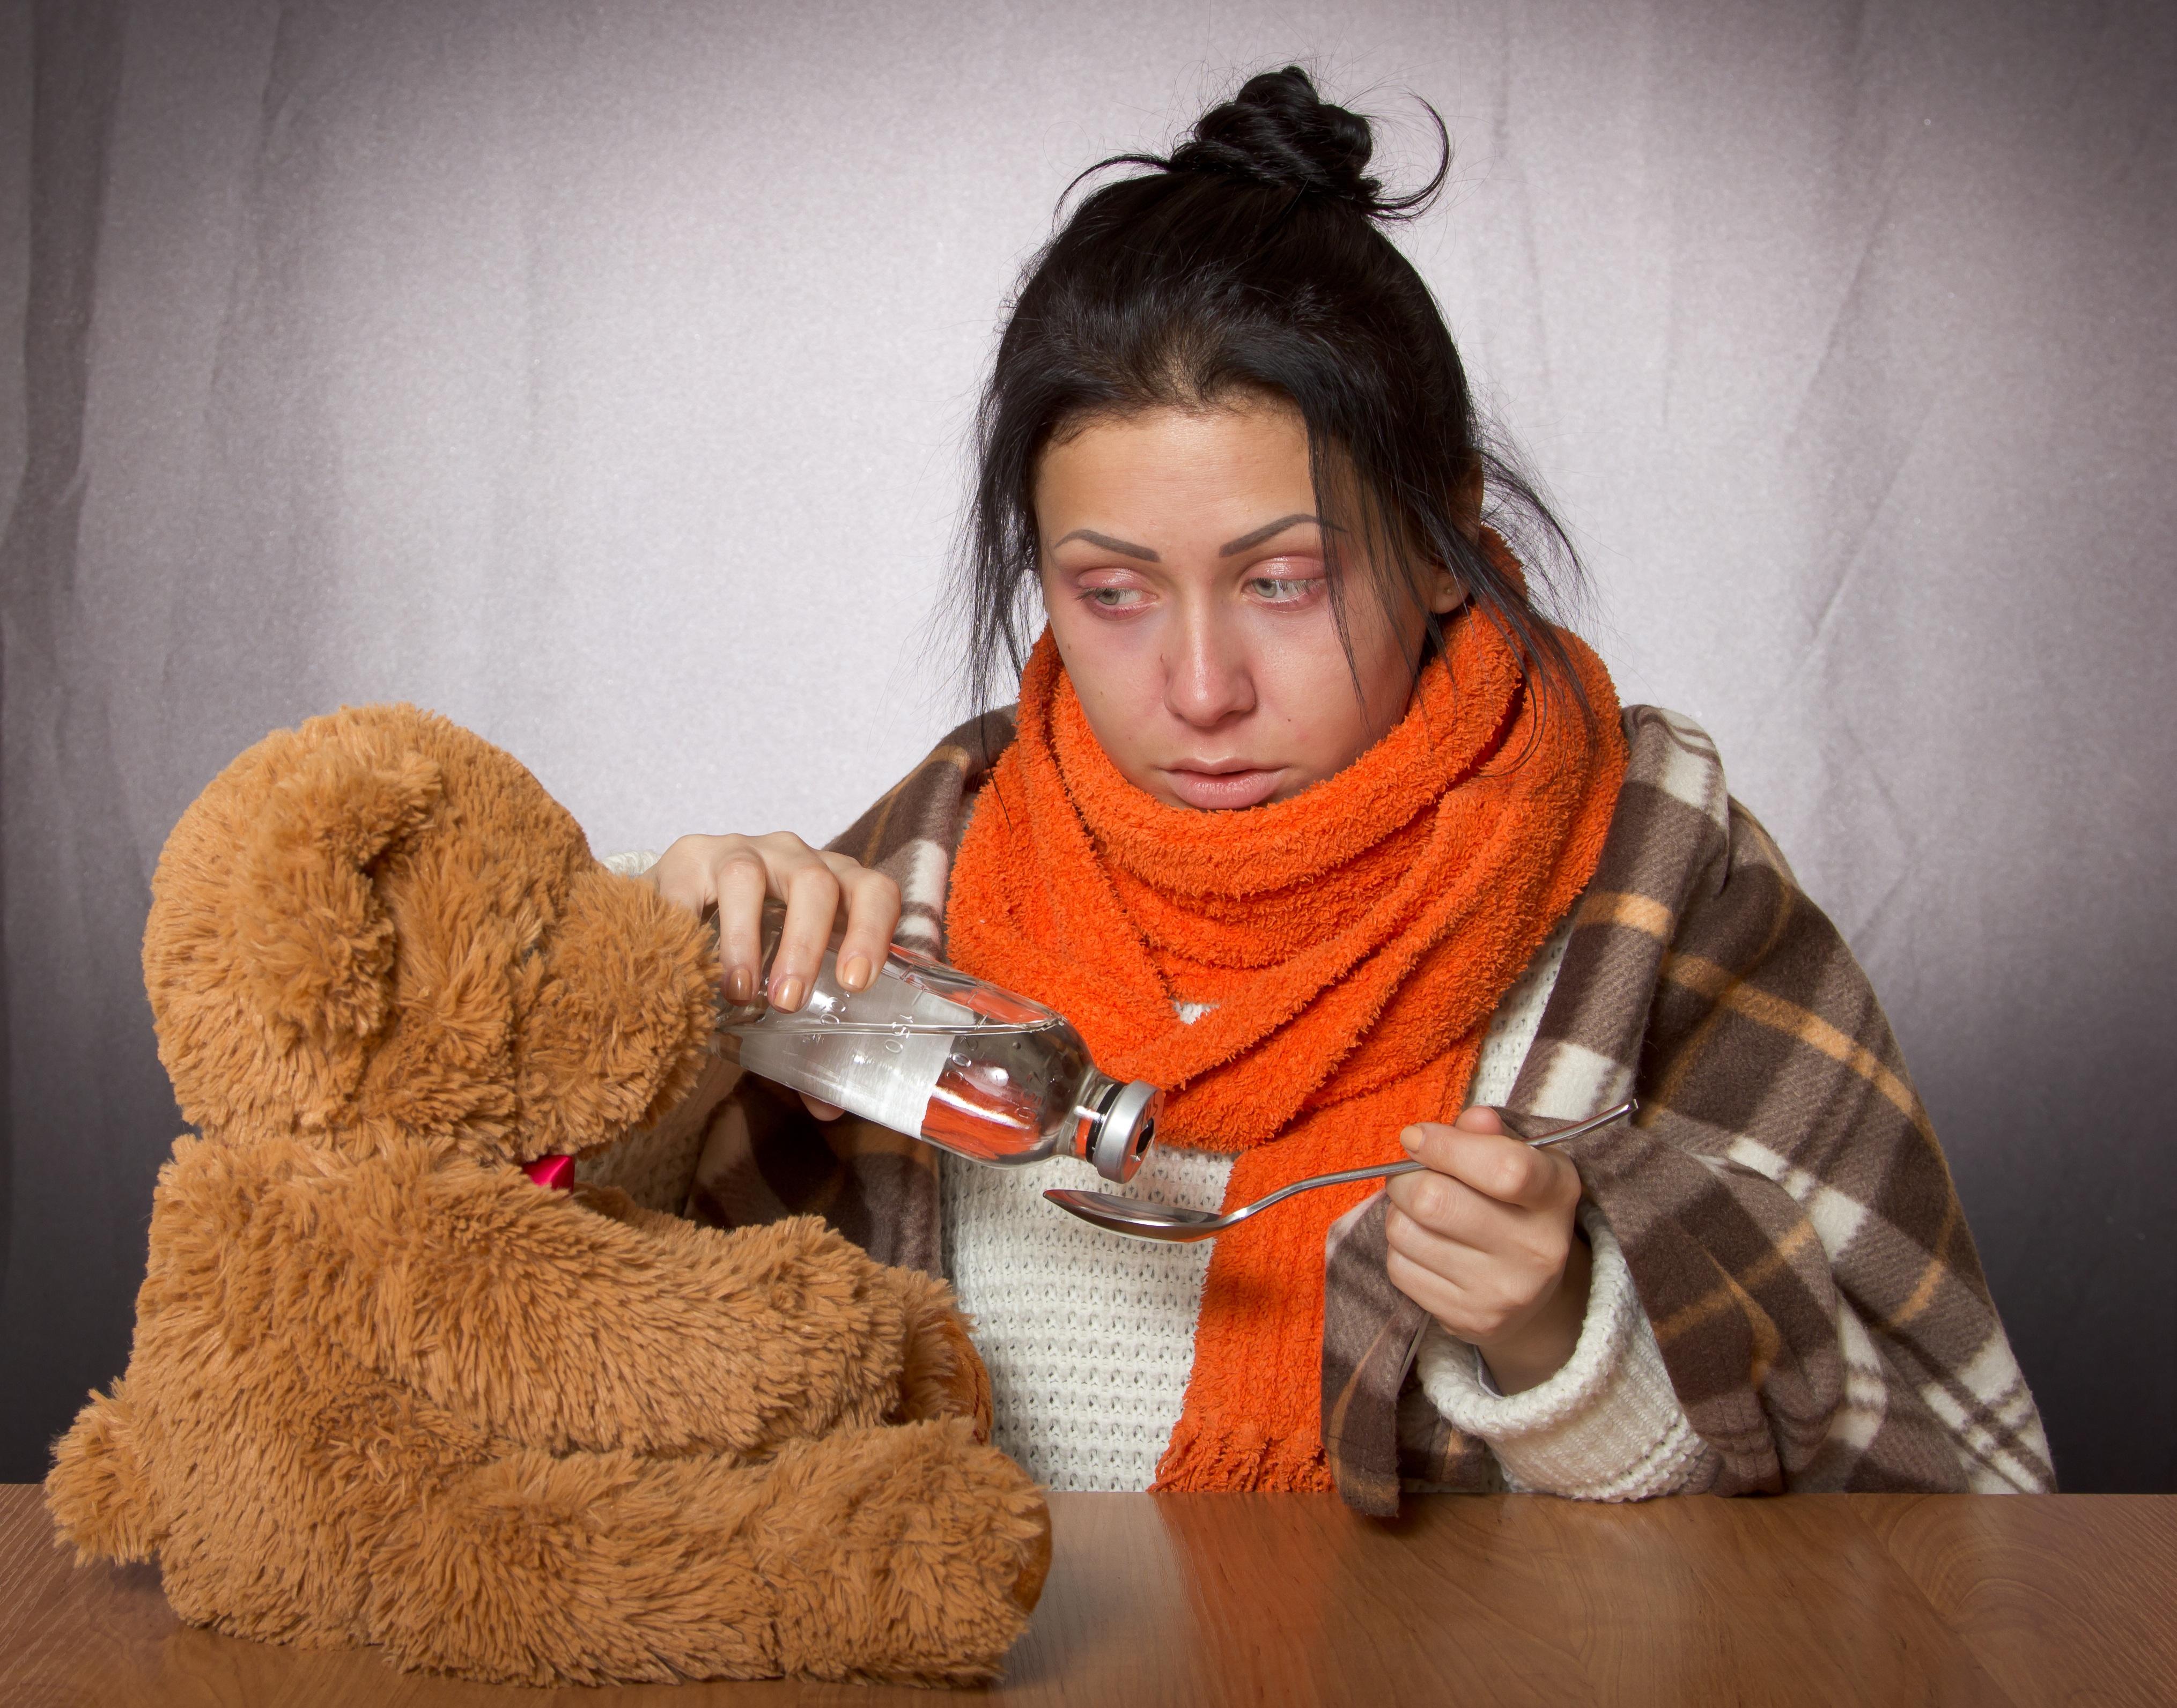 Fotos gratis : niña, niño, ropa, juguete, tejido de punto, textil ...